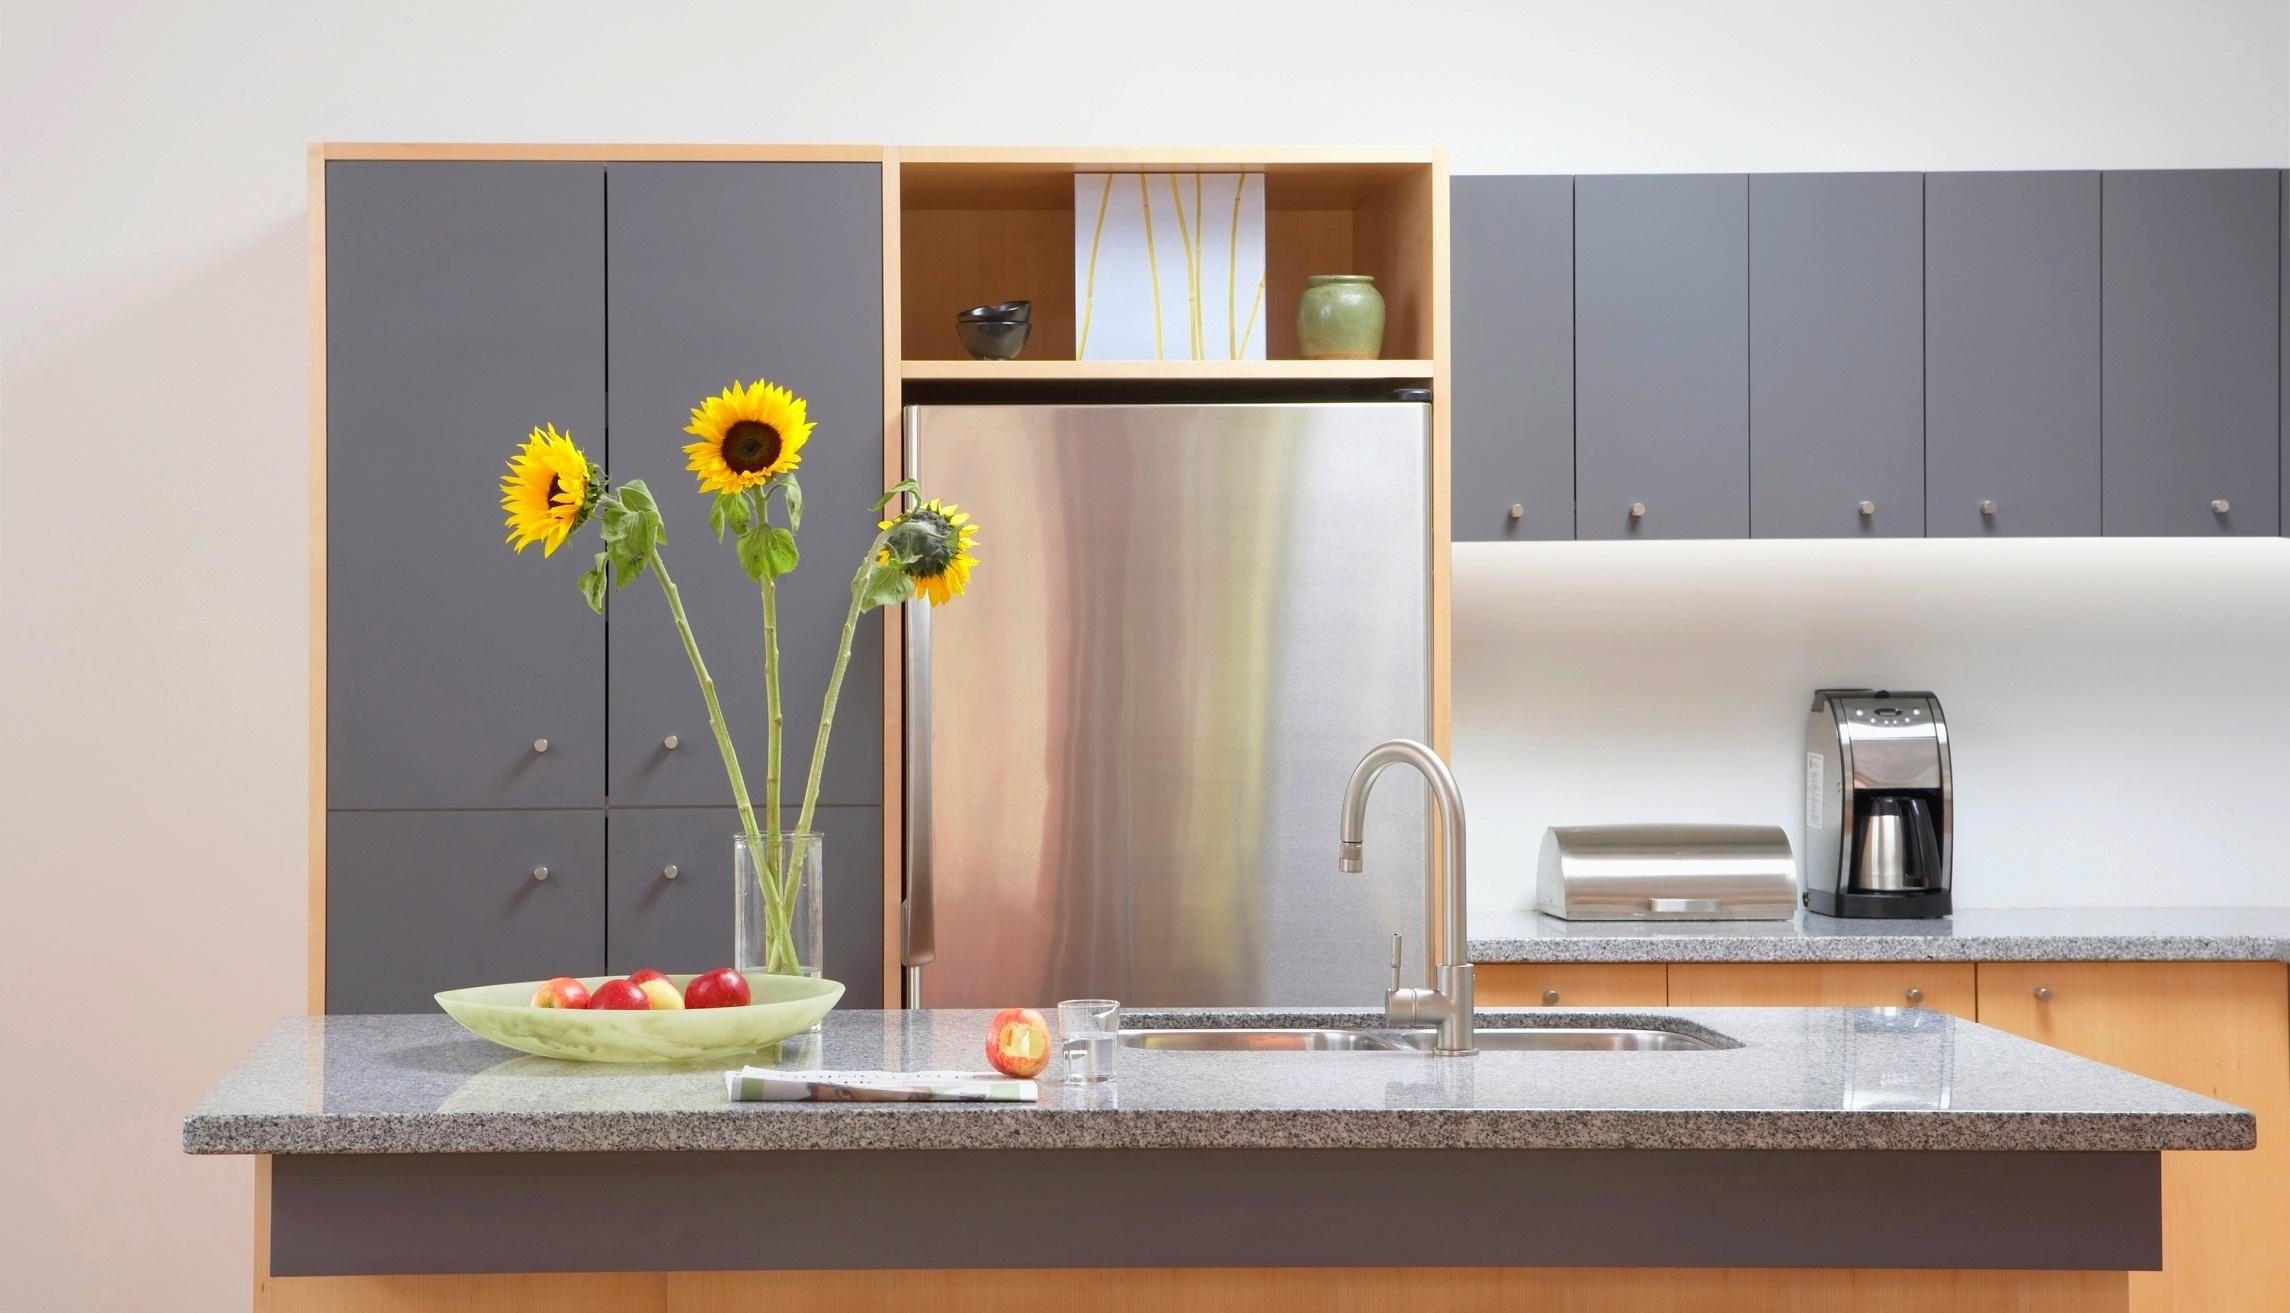 modern com lovely kitchen ideas lights hd wallpaper koffiekitten design cabinets home cabinet options led of hardwired creative lighting under